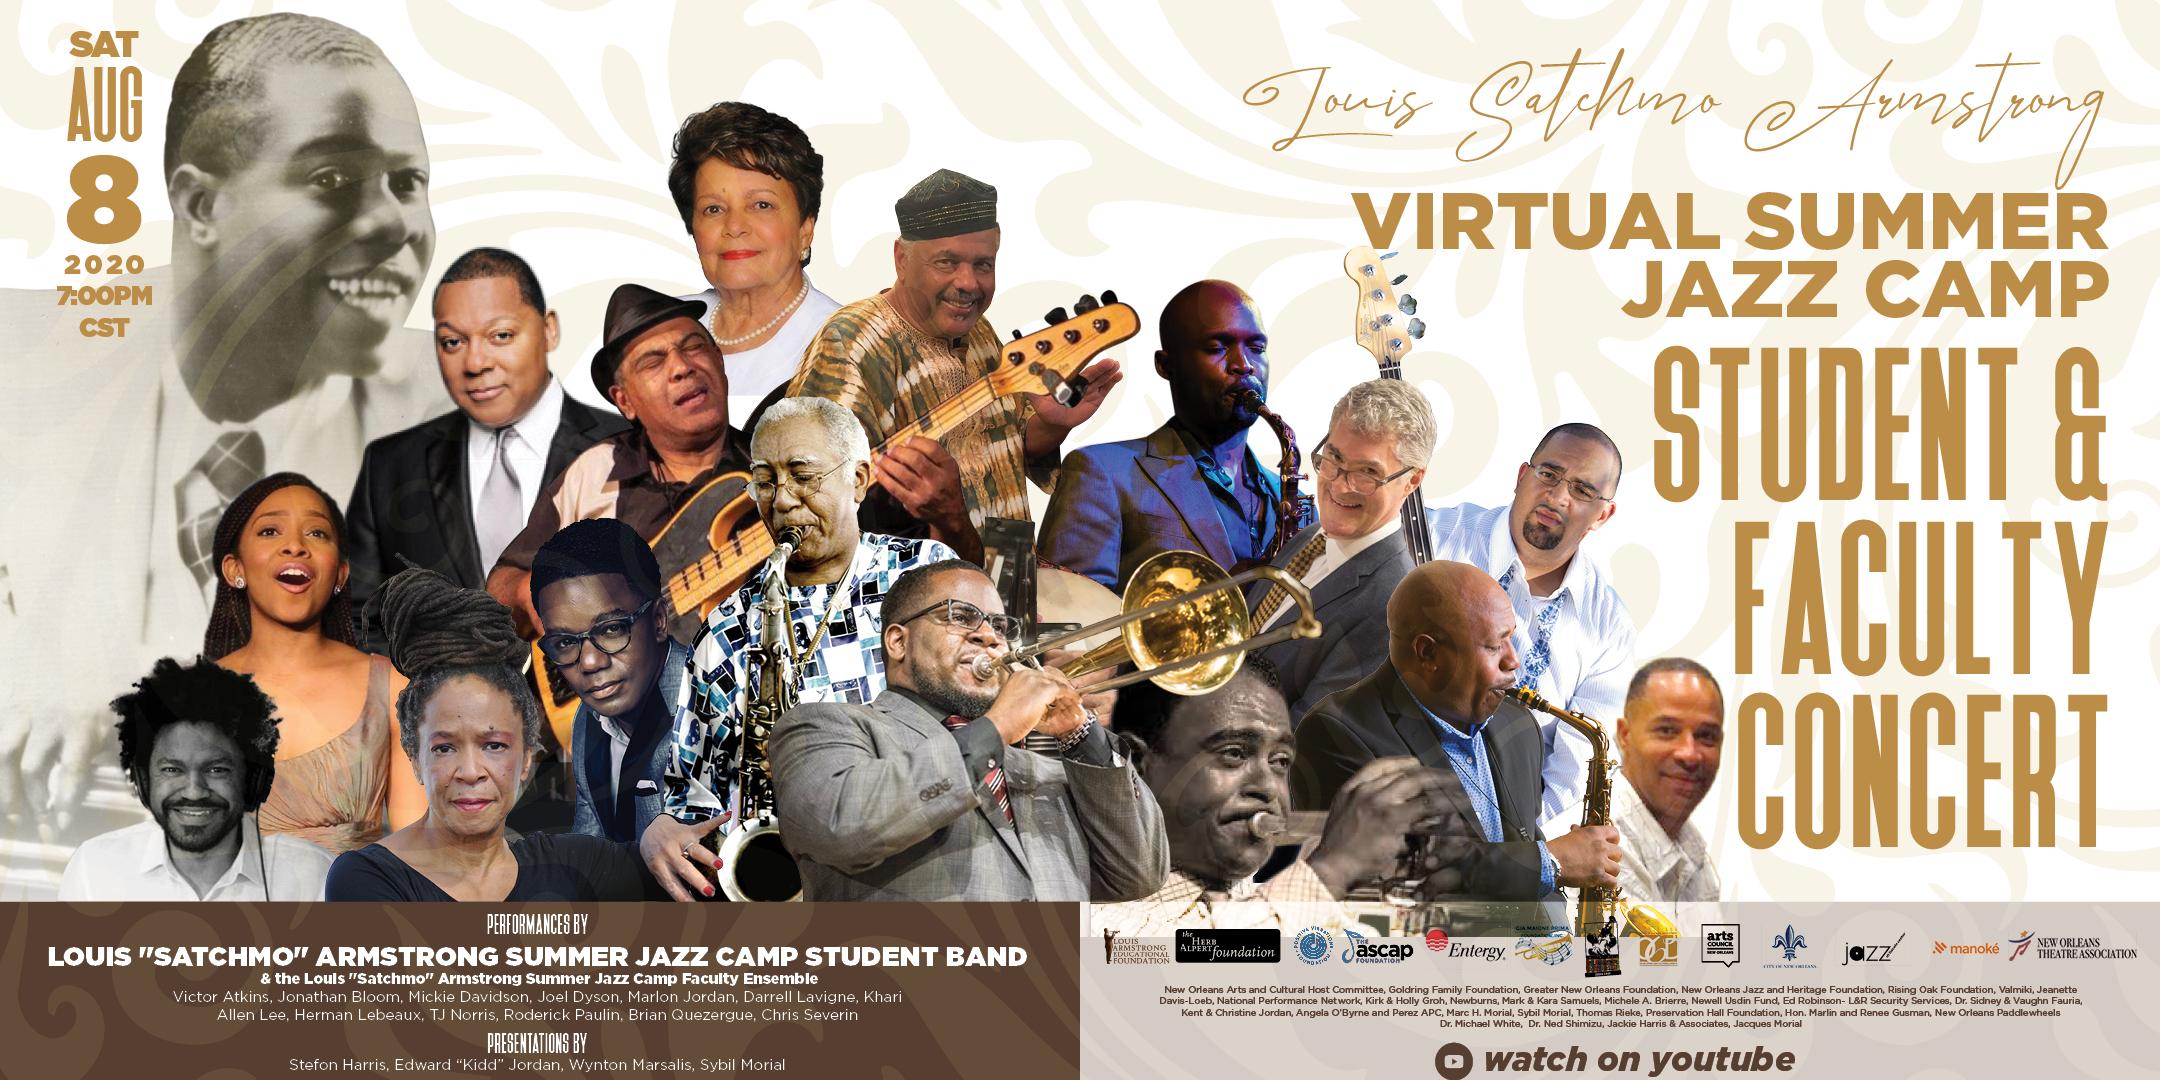 2020 Virtual Jazz Camp Concert Invite